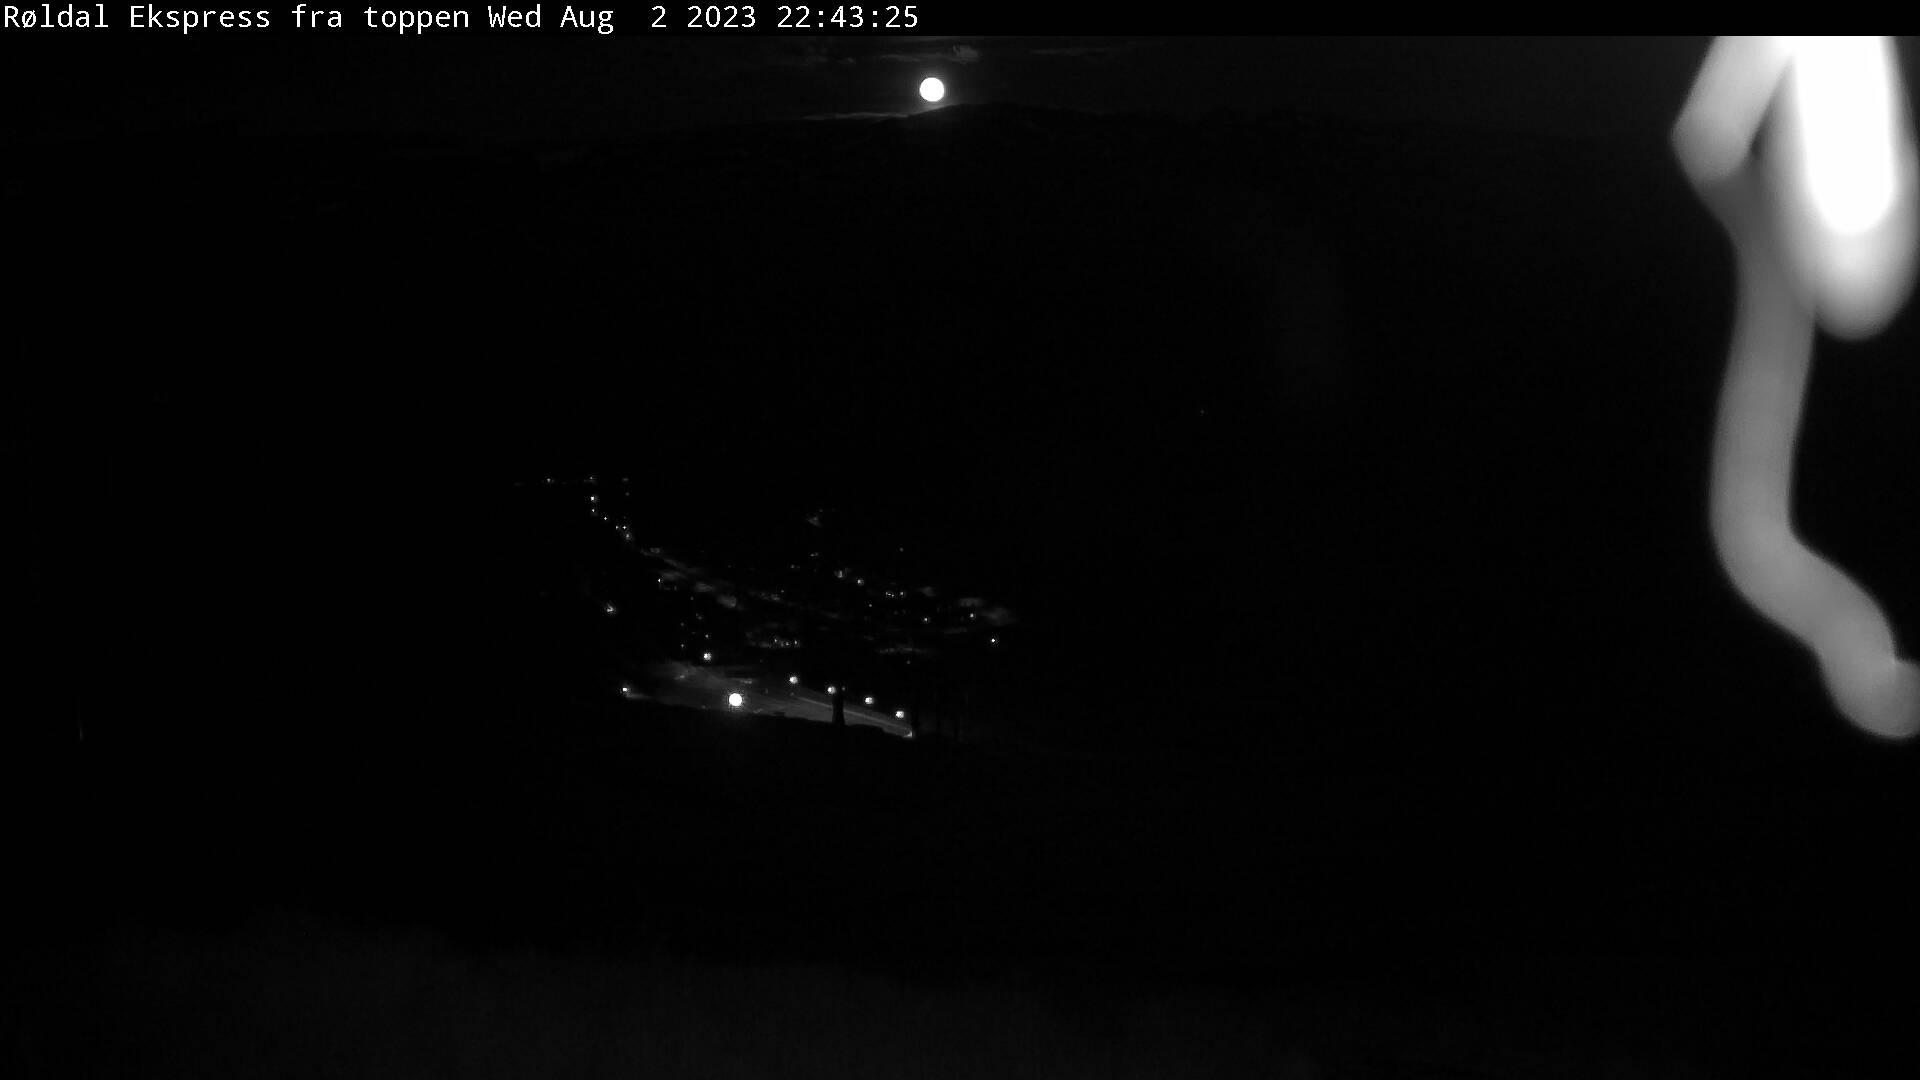 Webcam Røldal skisenter, Odda, Hordaland, Norwegen